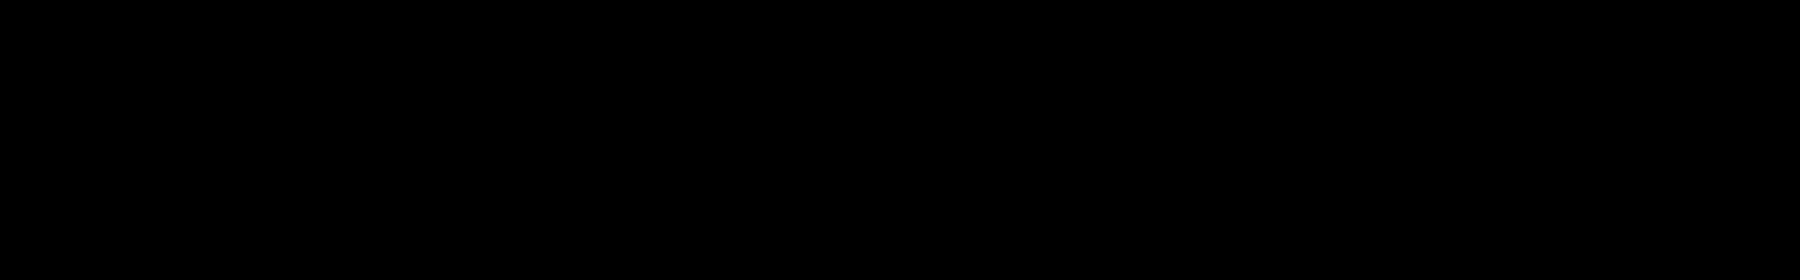 Tomorrowland Festival House audio waveform